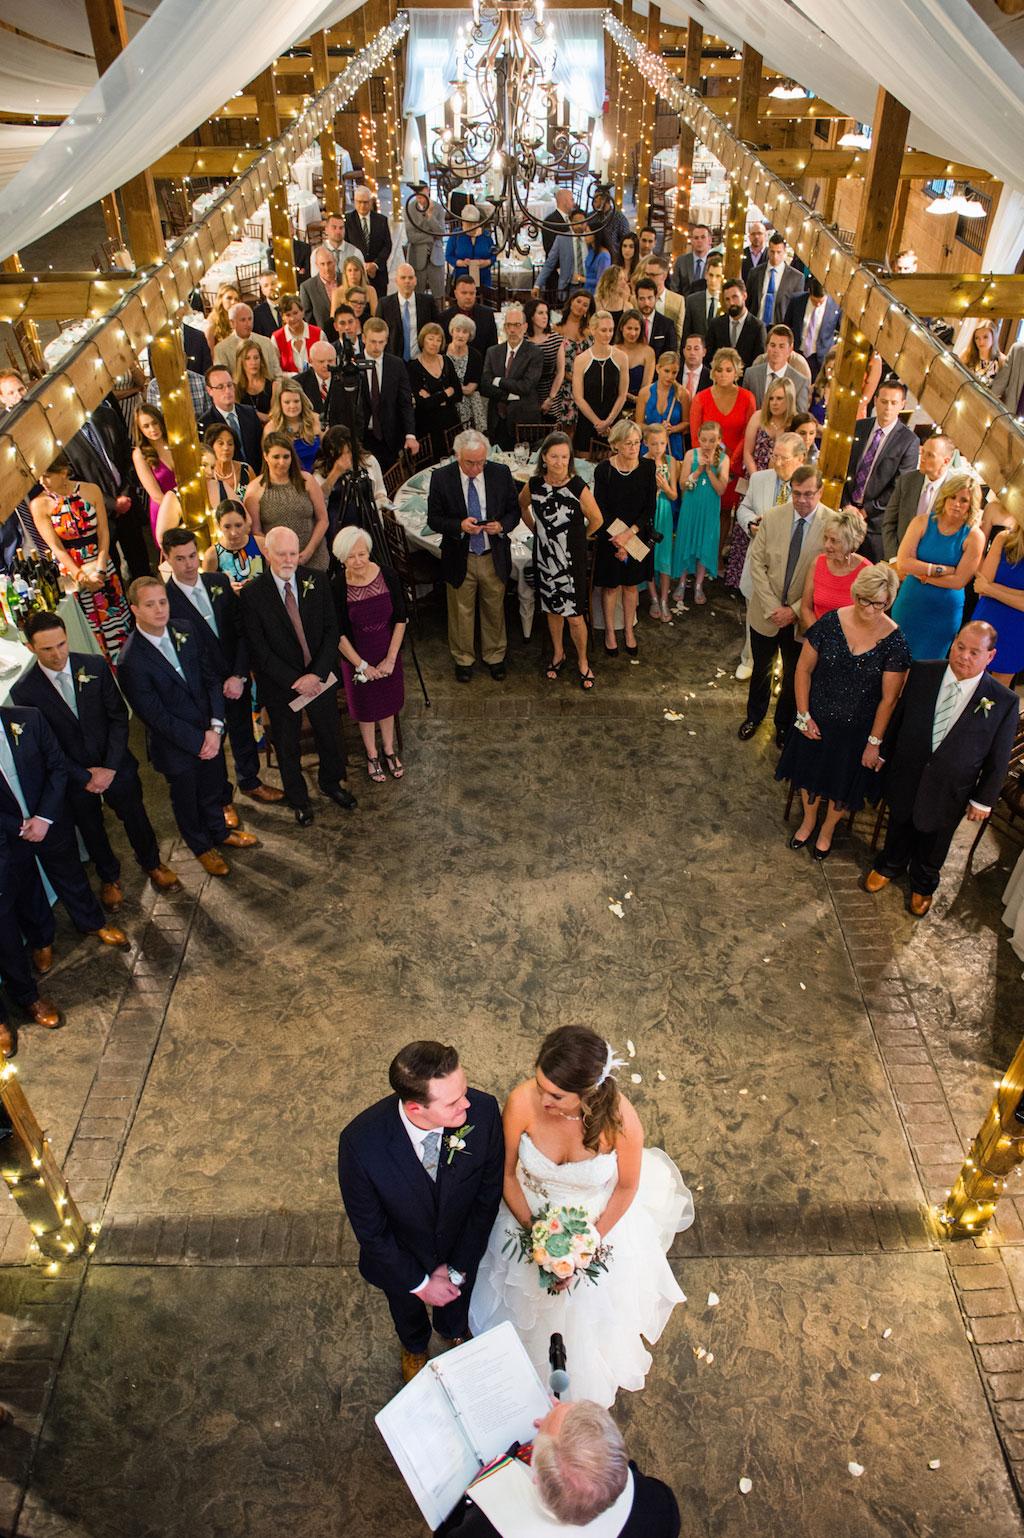 11-15-16-bluemont-vineyard-standing-ceremony-wedding-5